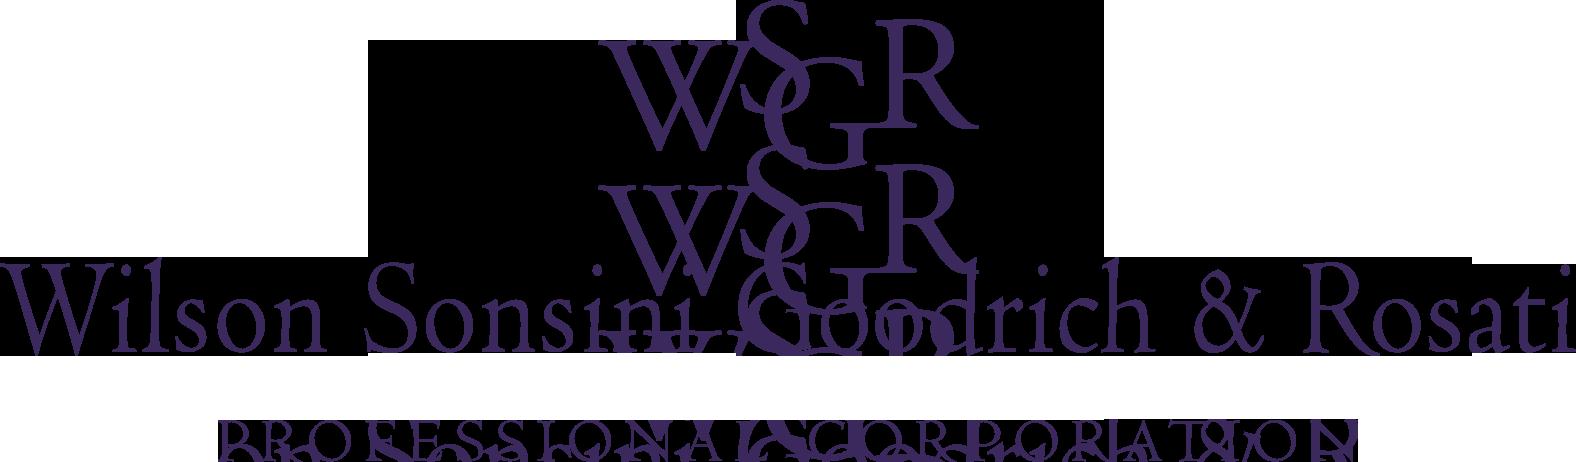 WSGR logo color